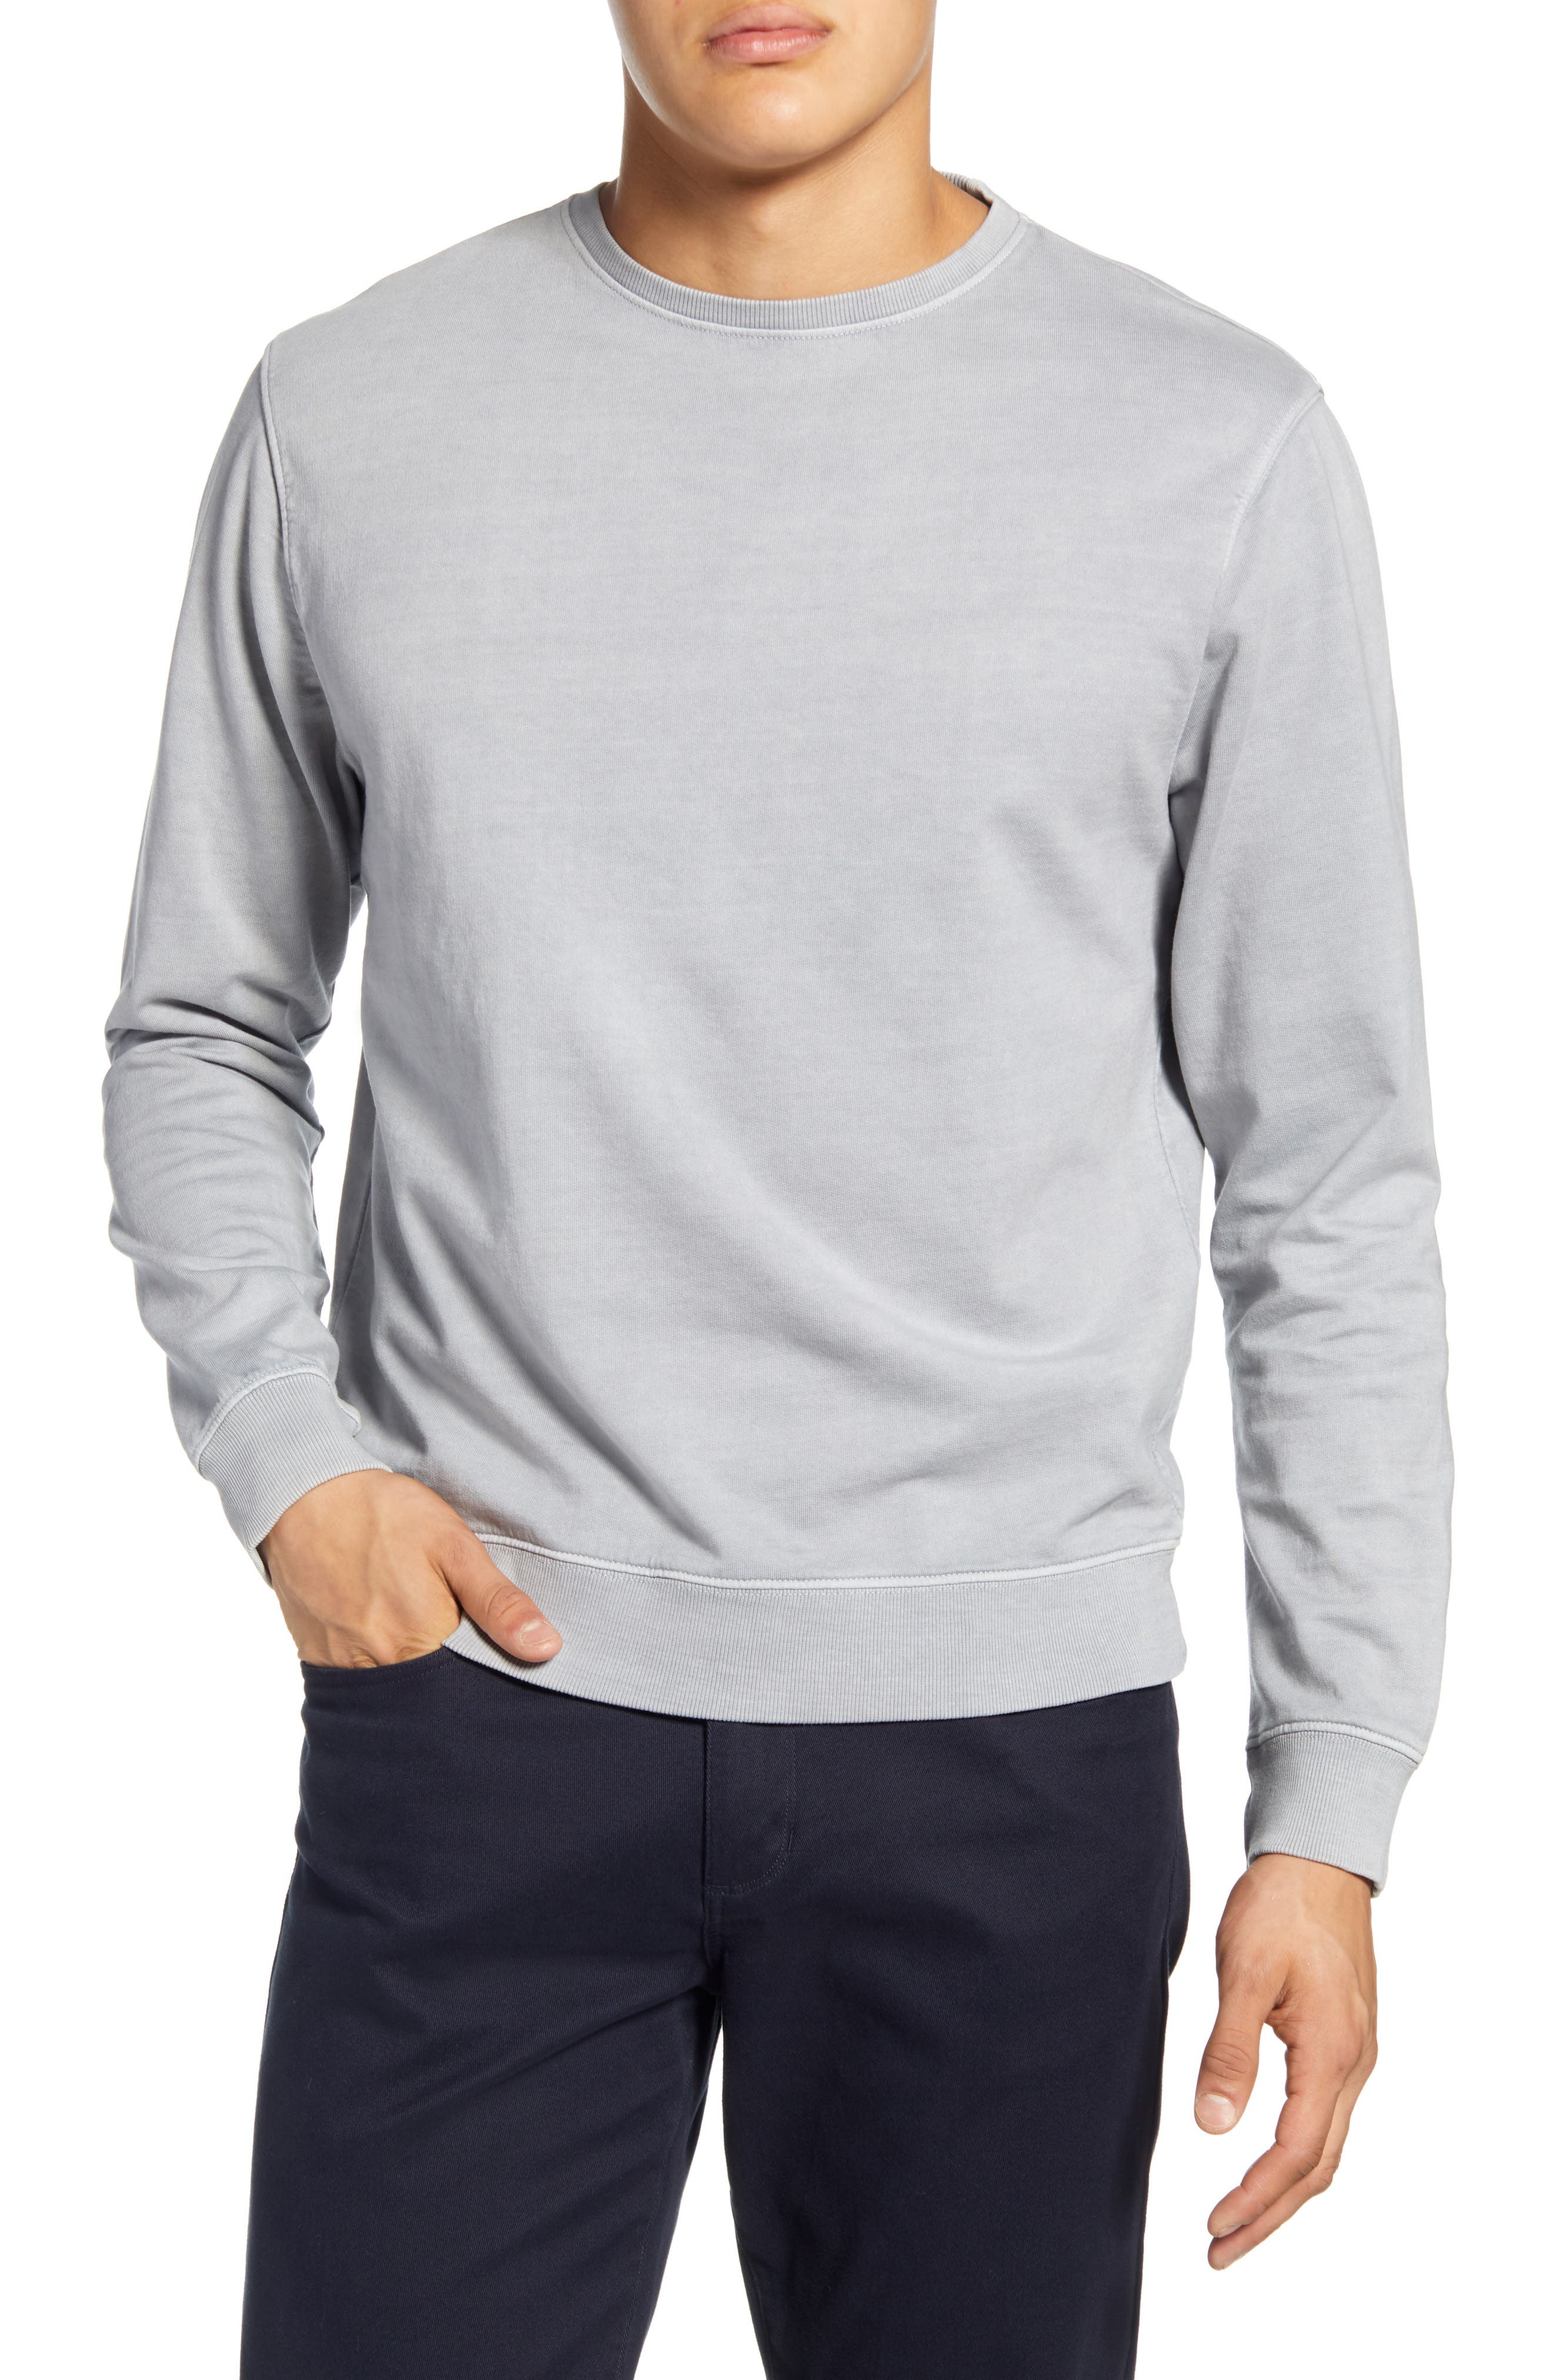 Haring Slim Fit Long Sleeve T-Shirt